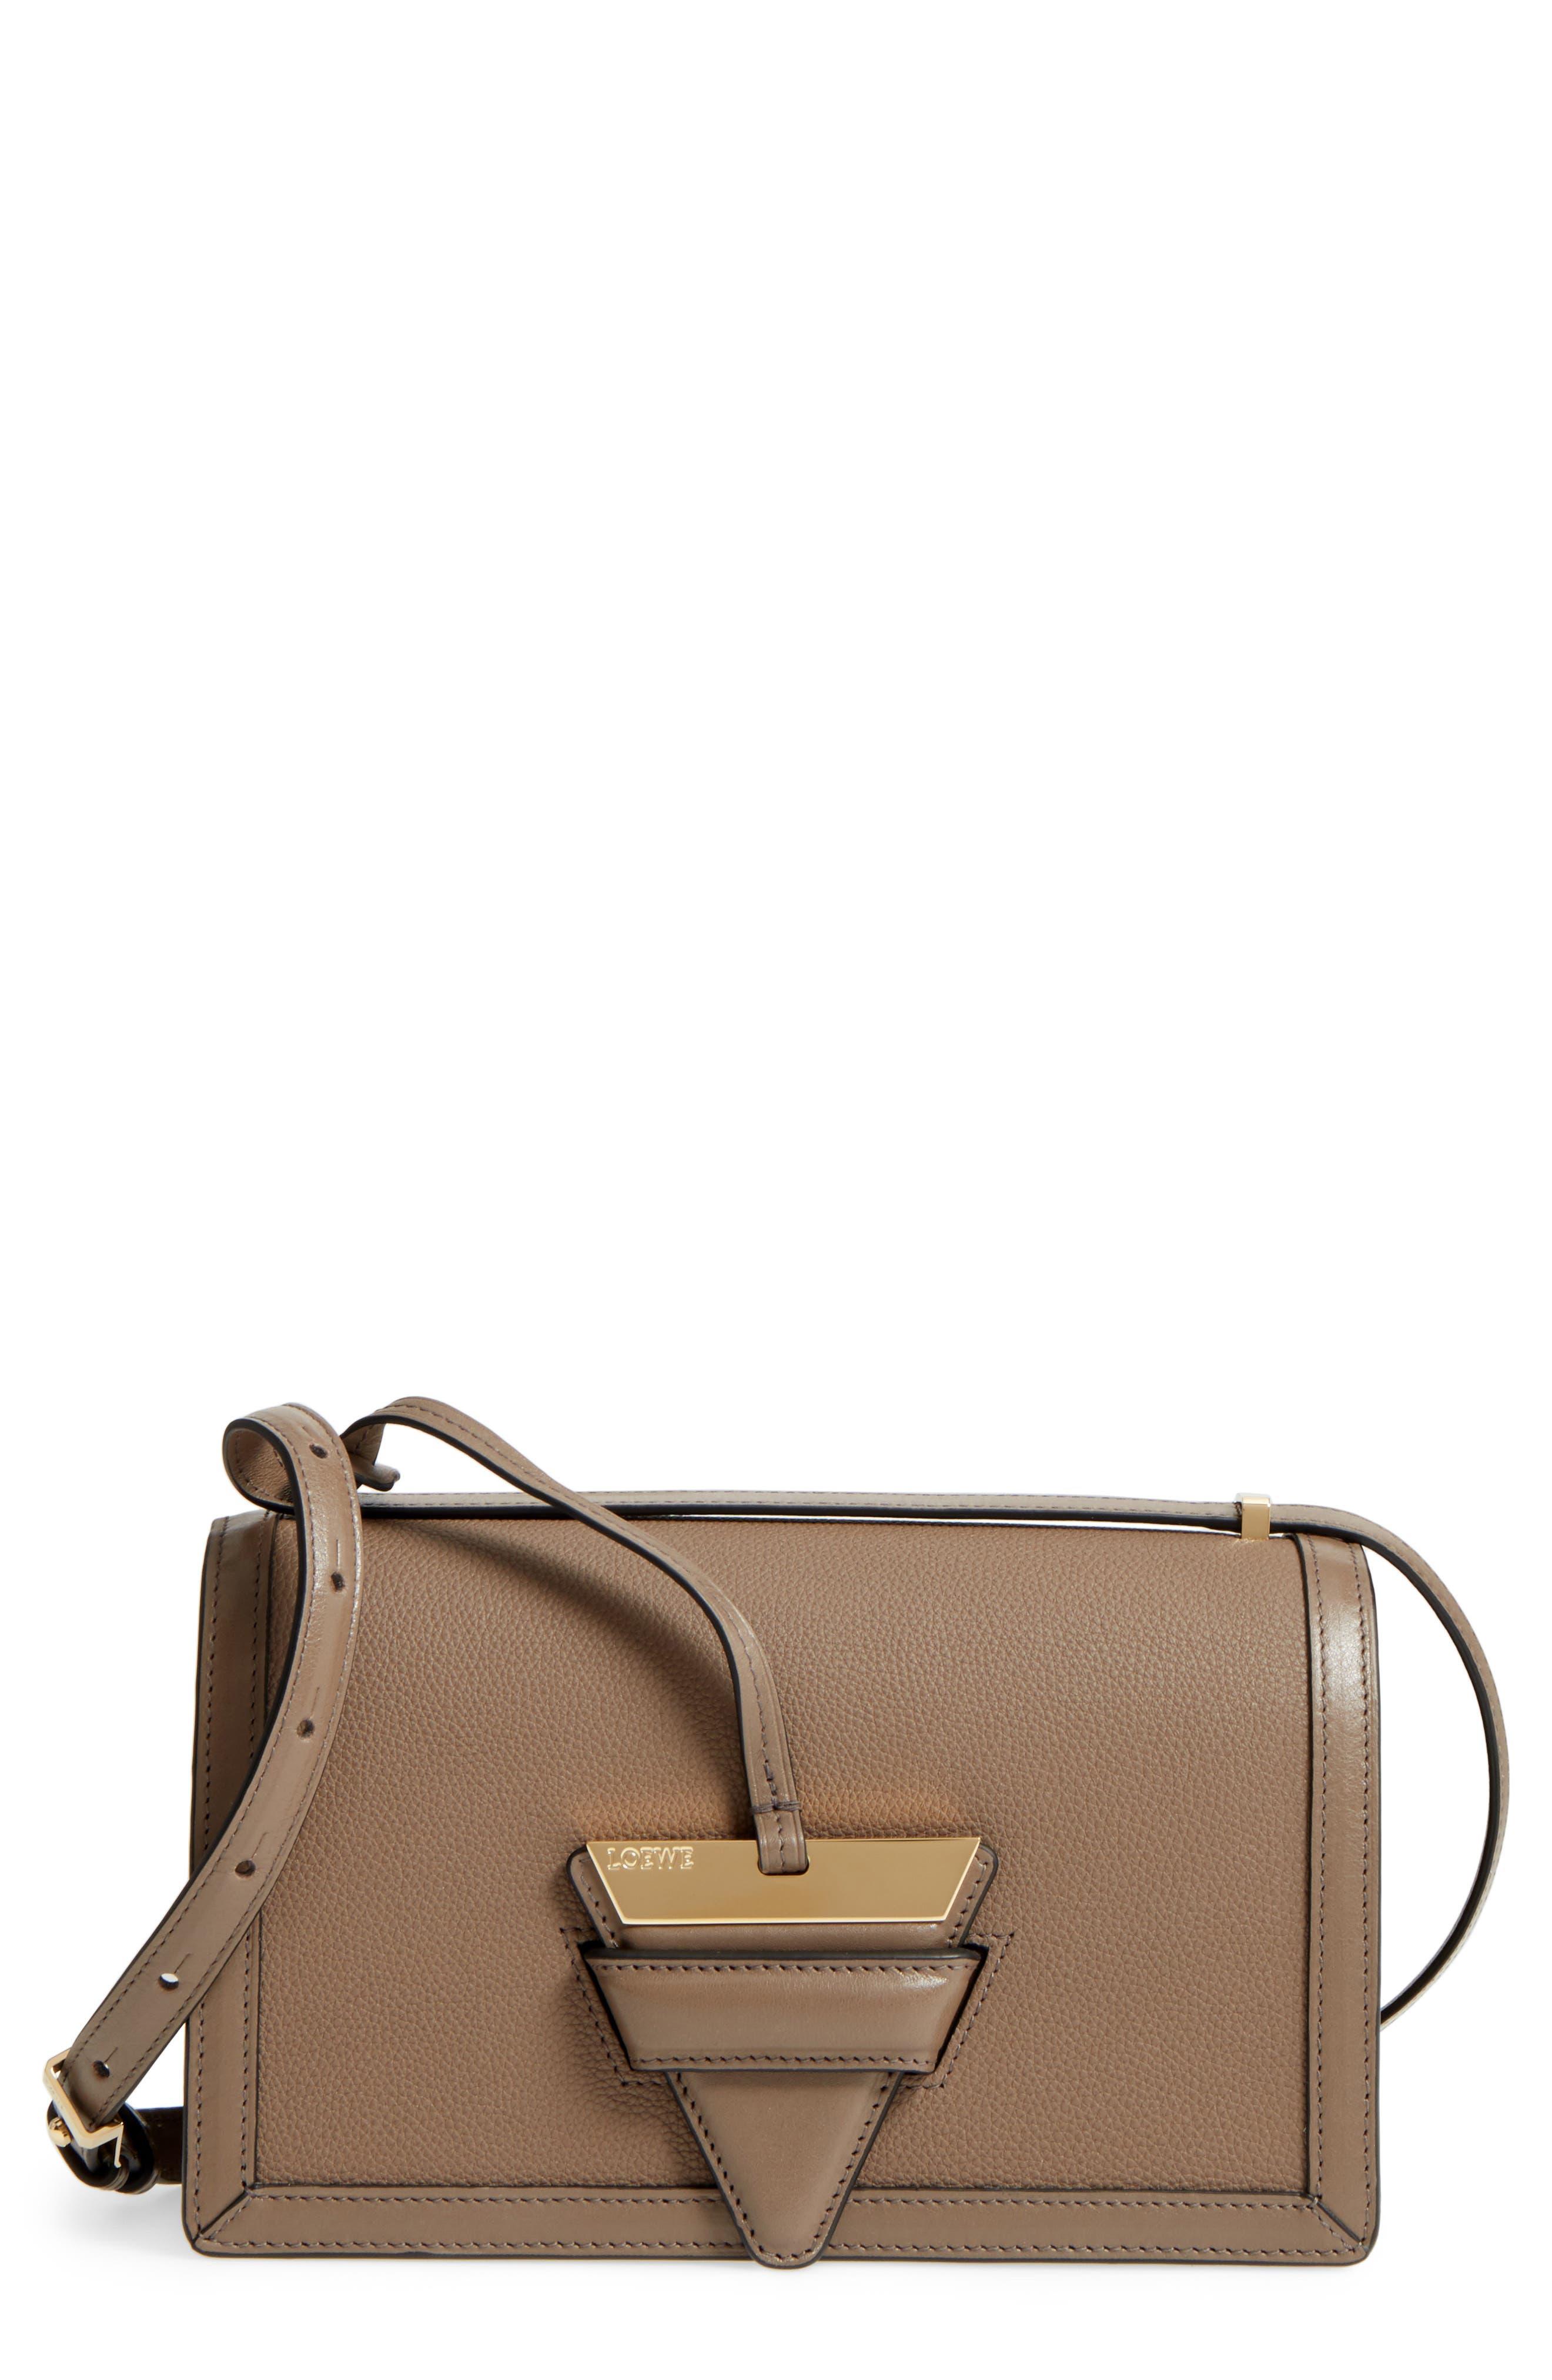 Alternate Image 1 Selected - Loewe Medium Barcelona Leather Crossbody Bag